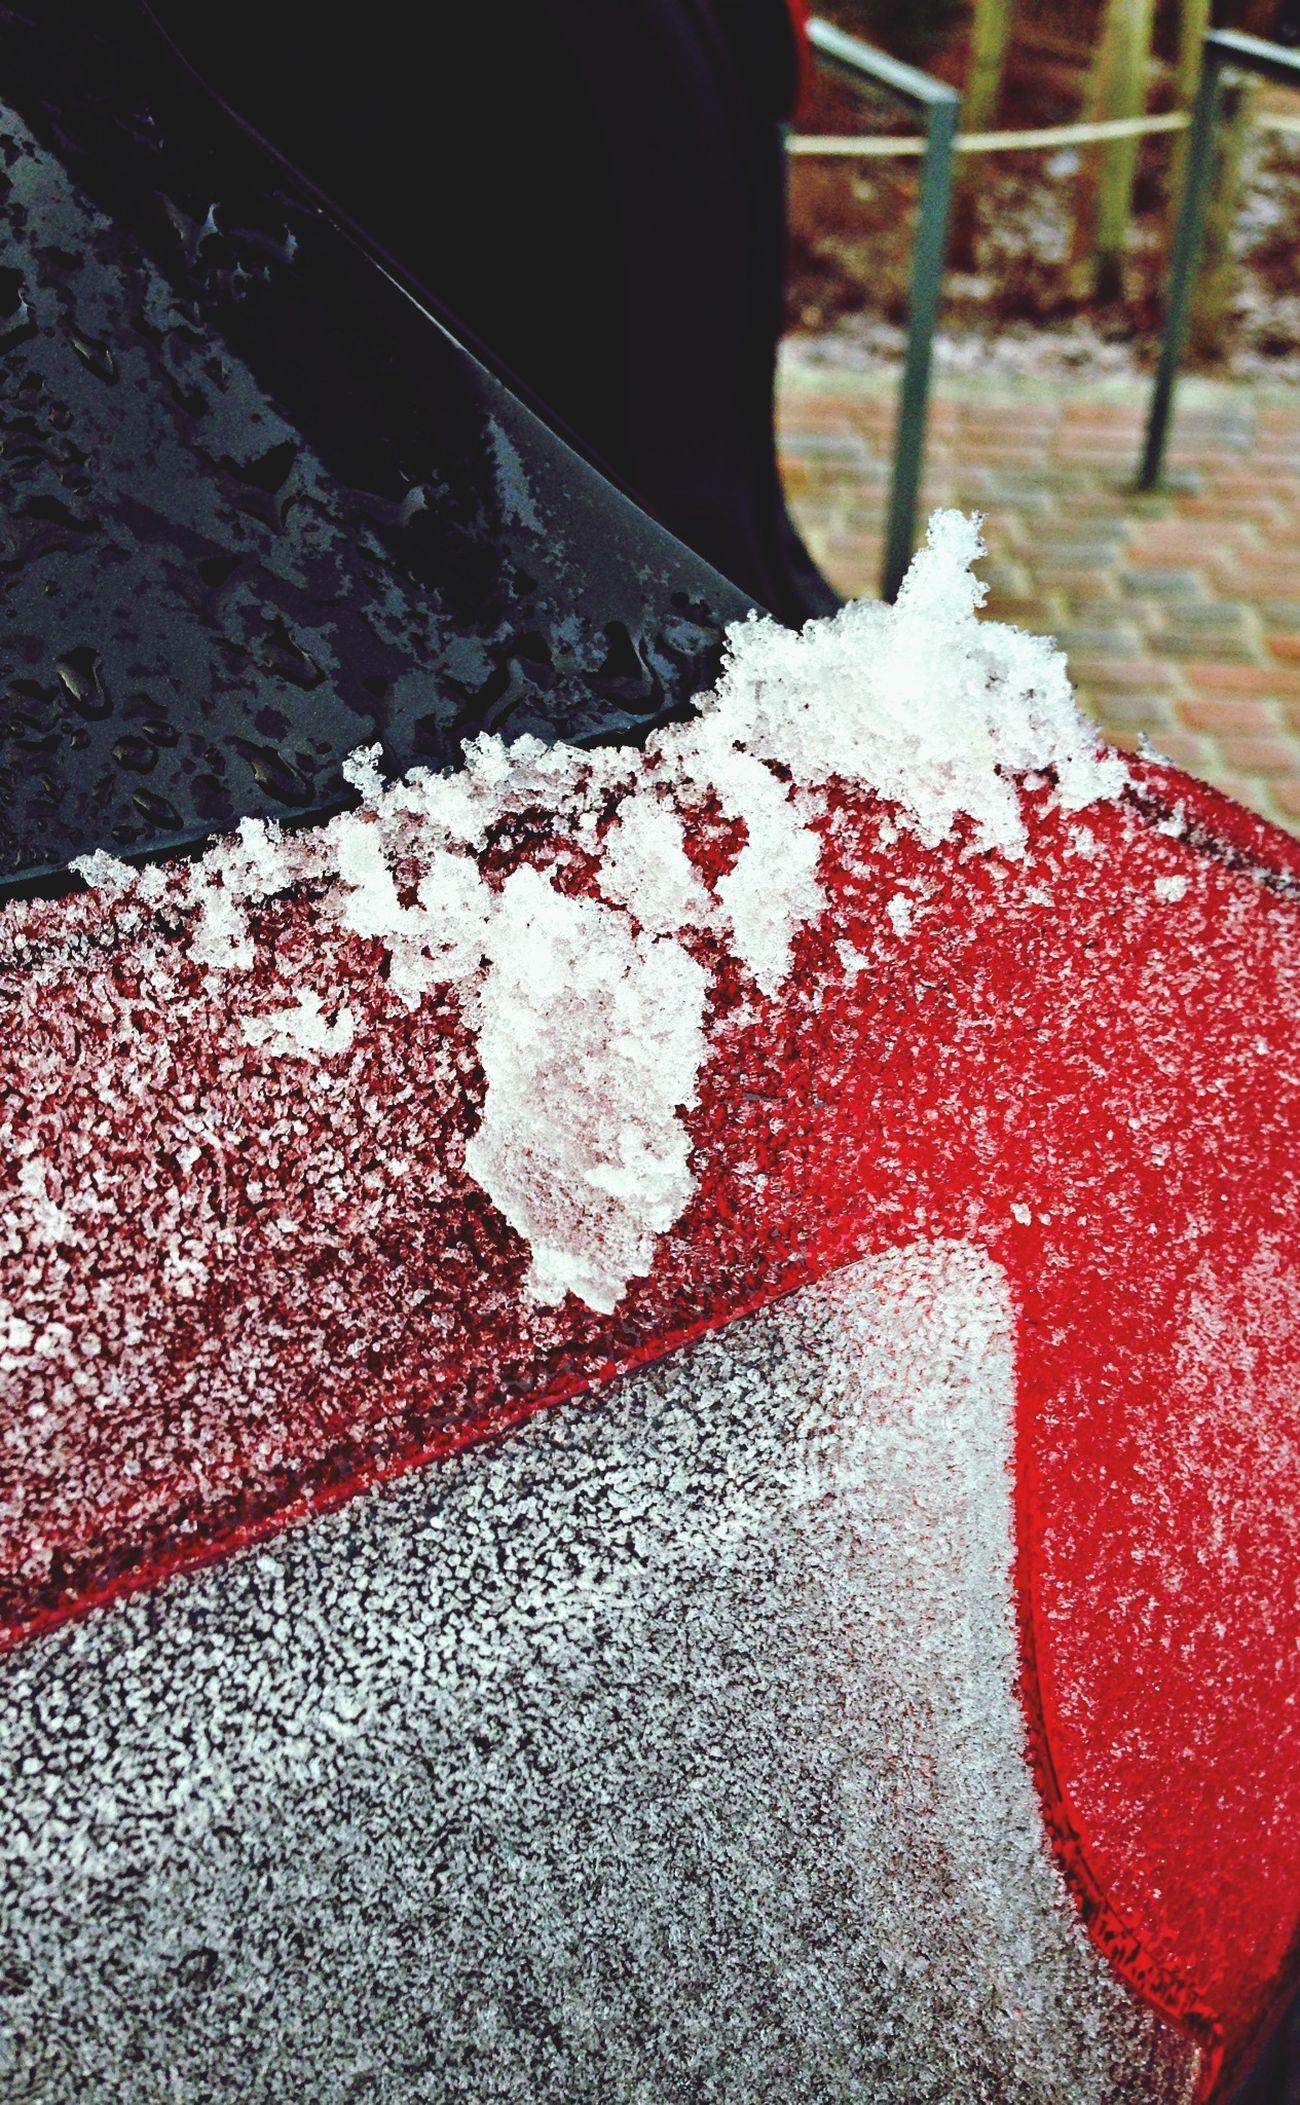 Winter Zinnowitz Frosty Cold